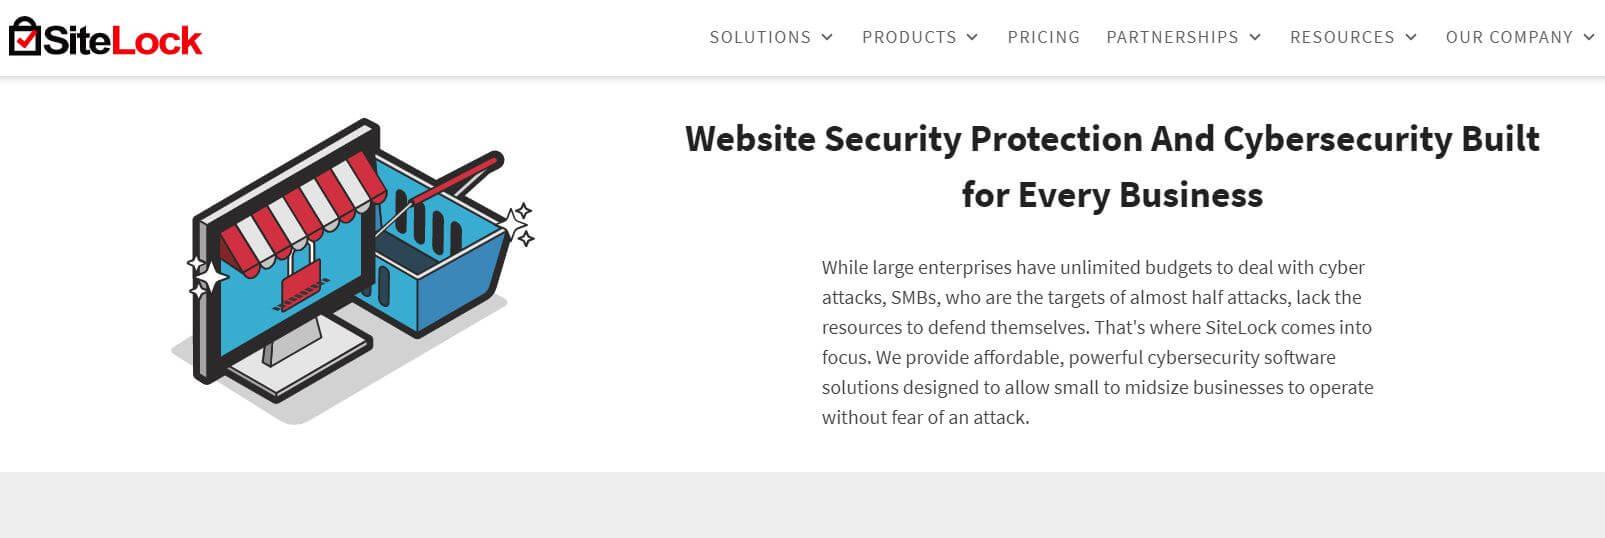 Sitelock Homepage Photo